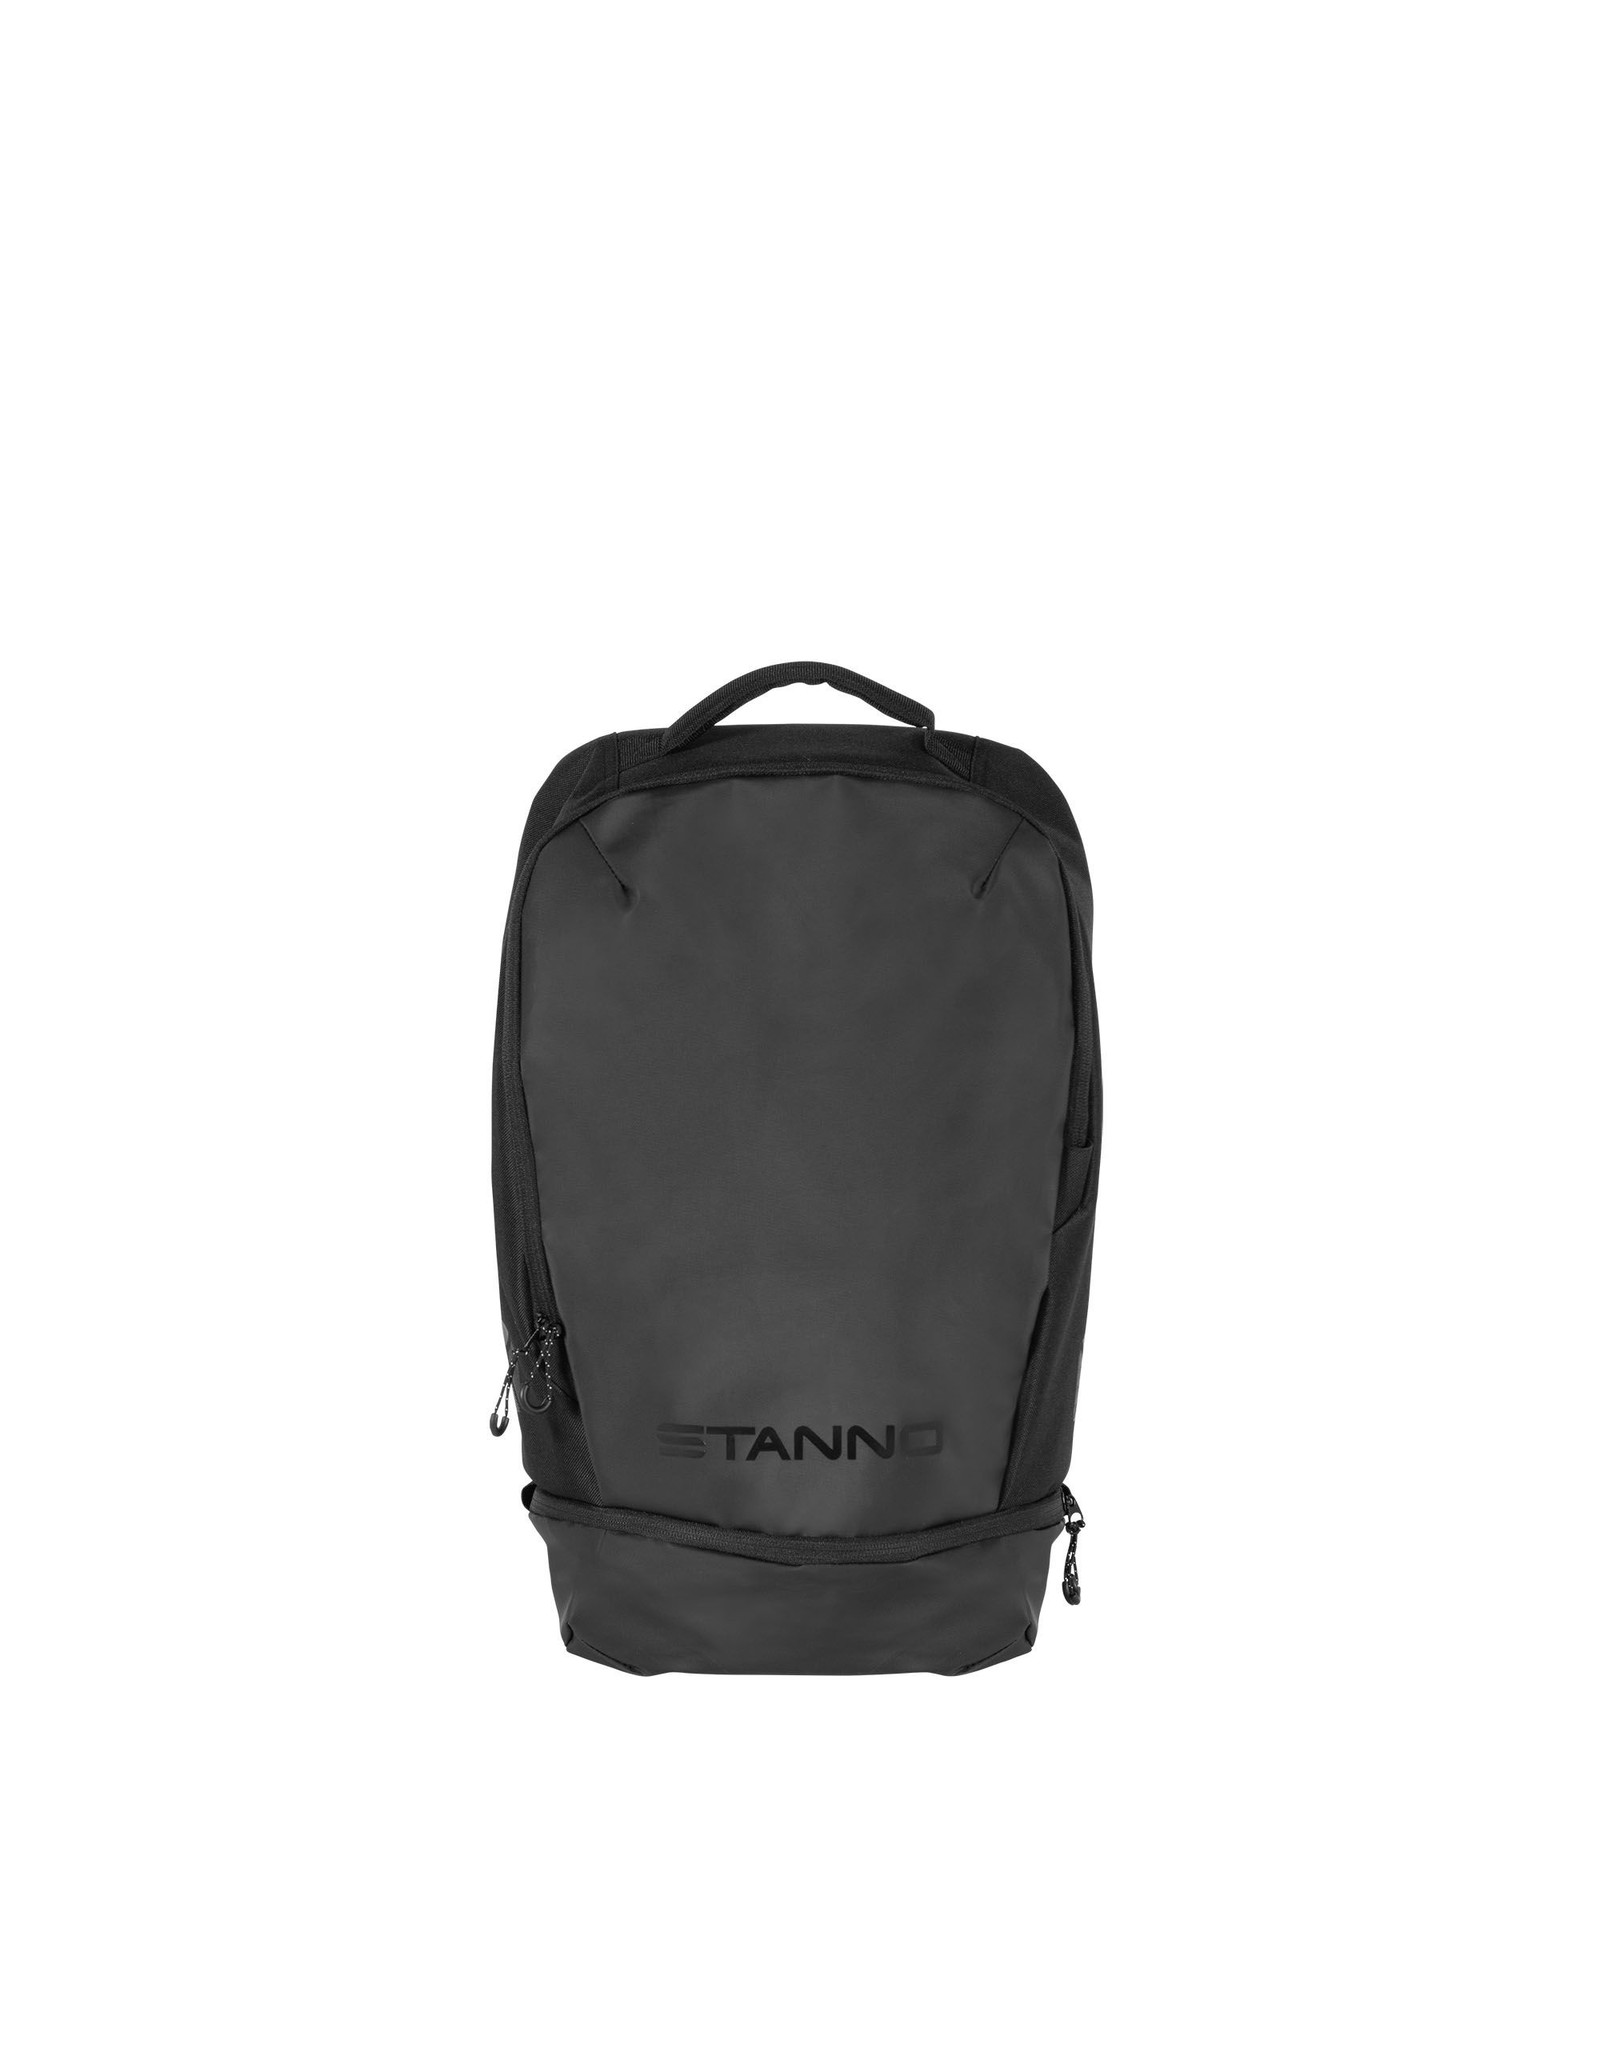 Stanno Functionals Raven Backpack II